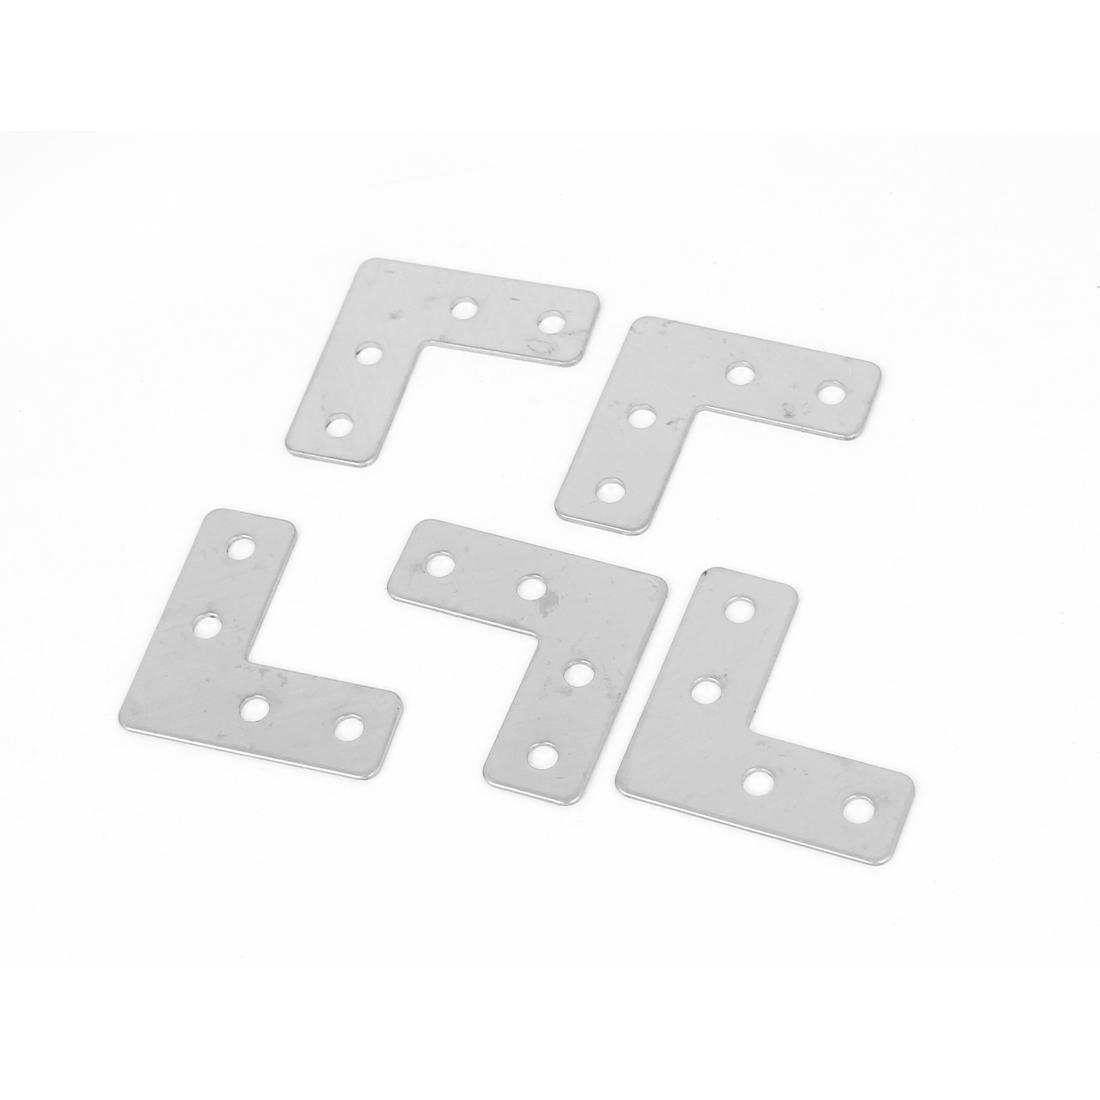 Furniture 40mmx40mm L Shape Right Angle Flat Plate Corner Brace Bracket 5Pcs